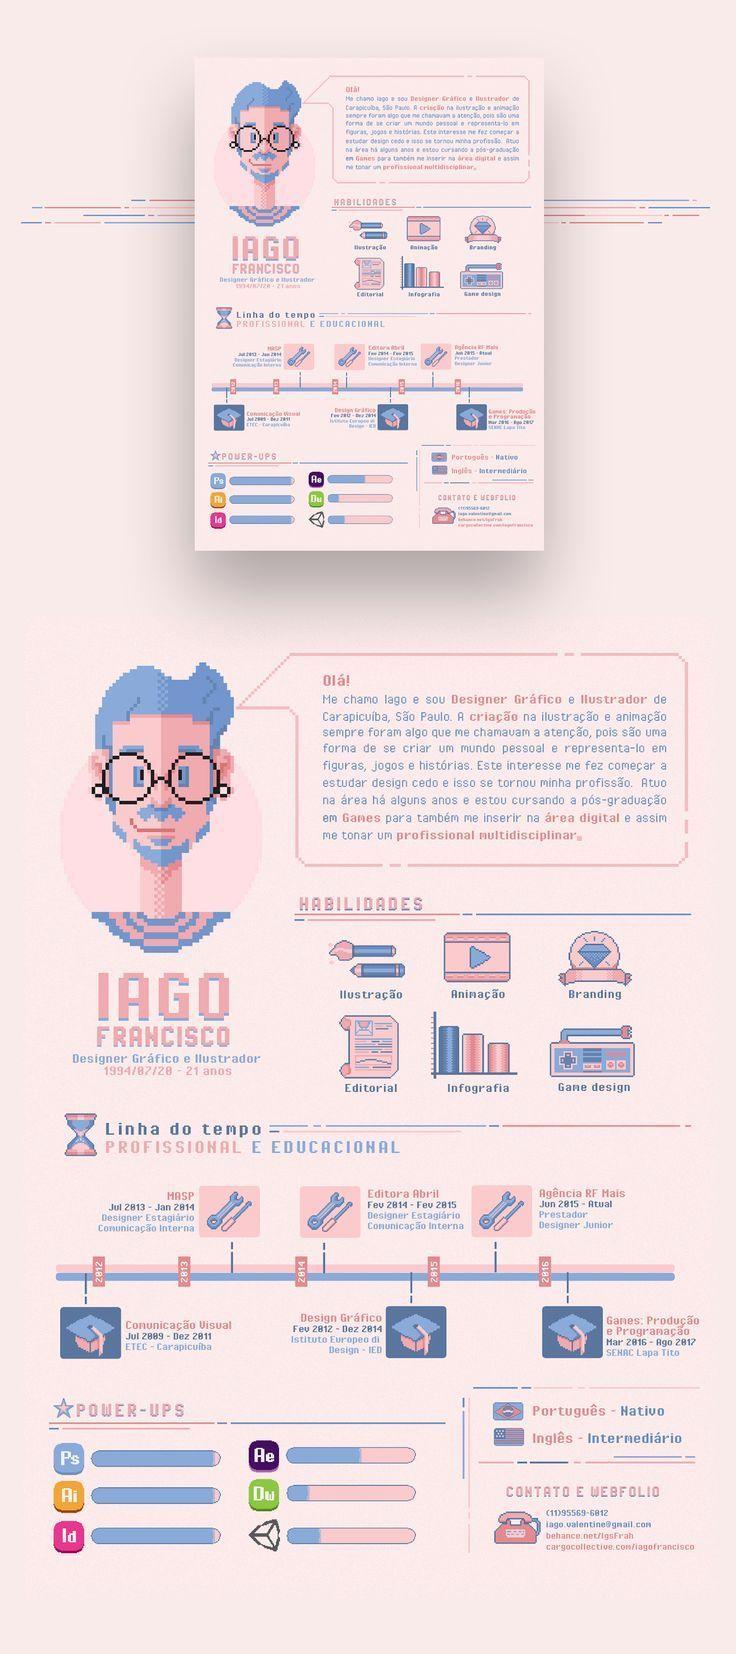 Resume infographic Resume infographic Iago Francisco